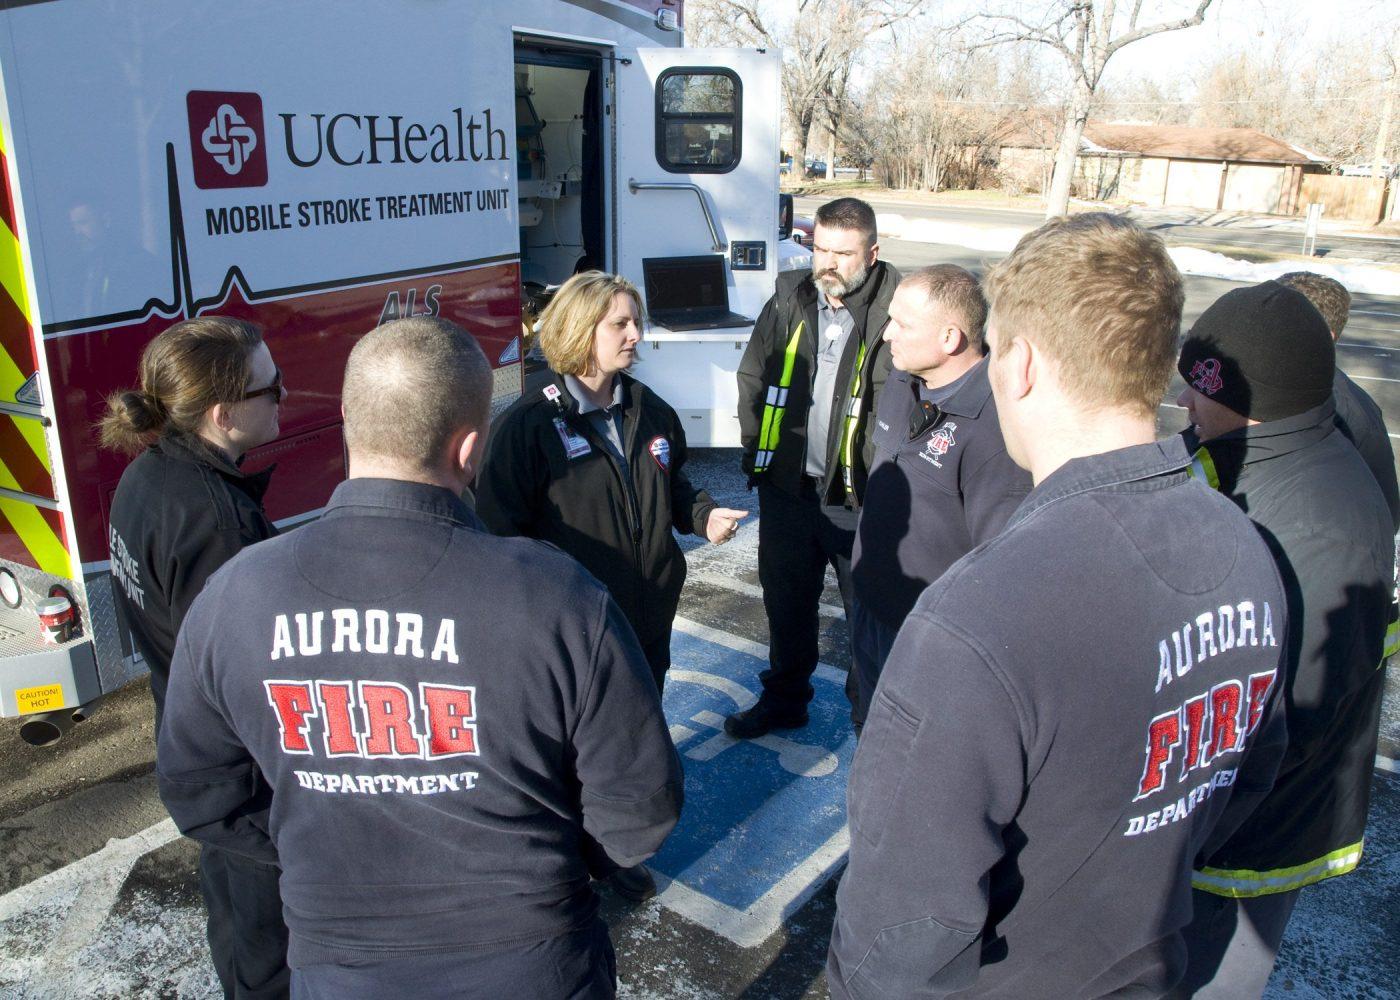 Schimpf talks with the Aurora PD